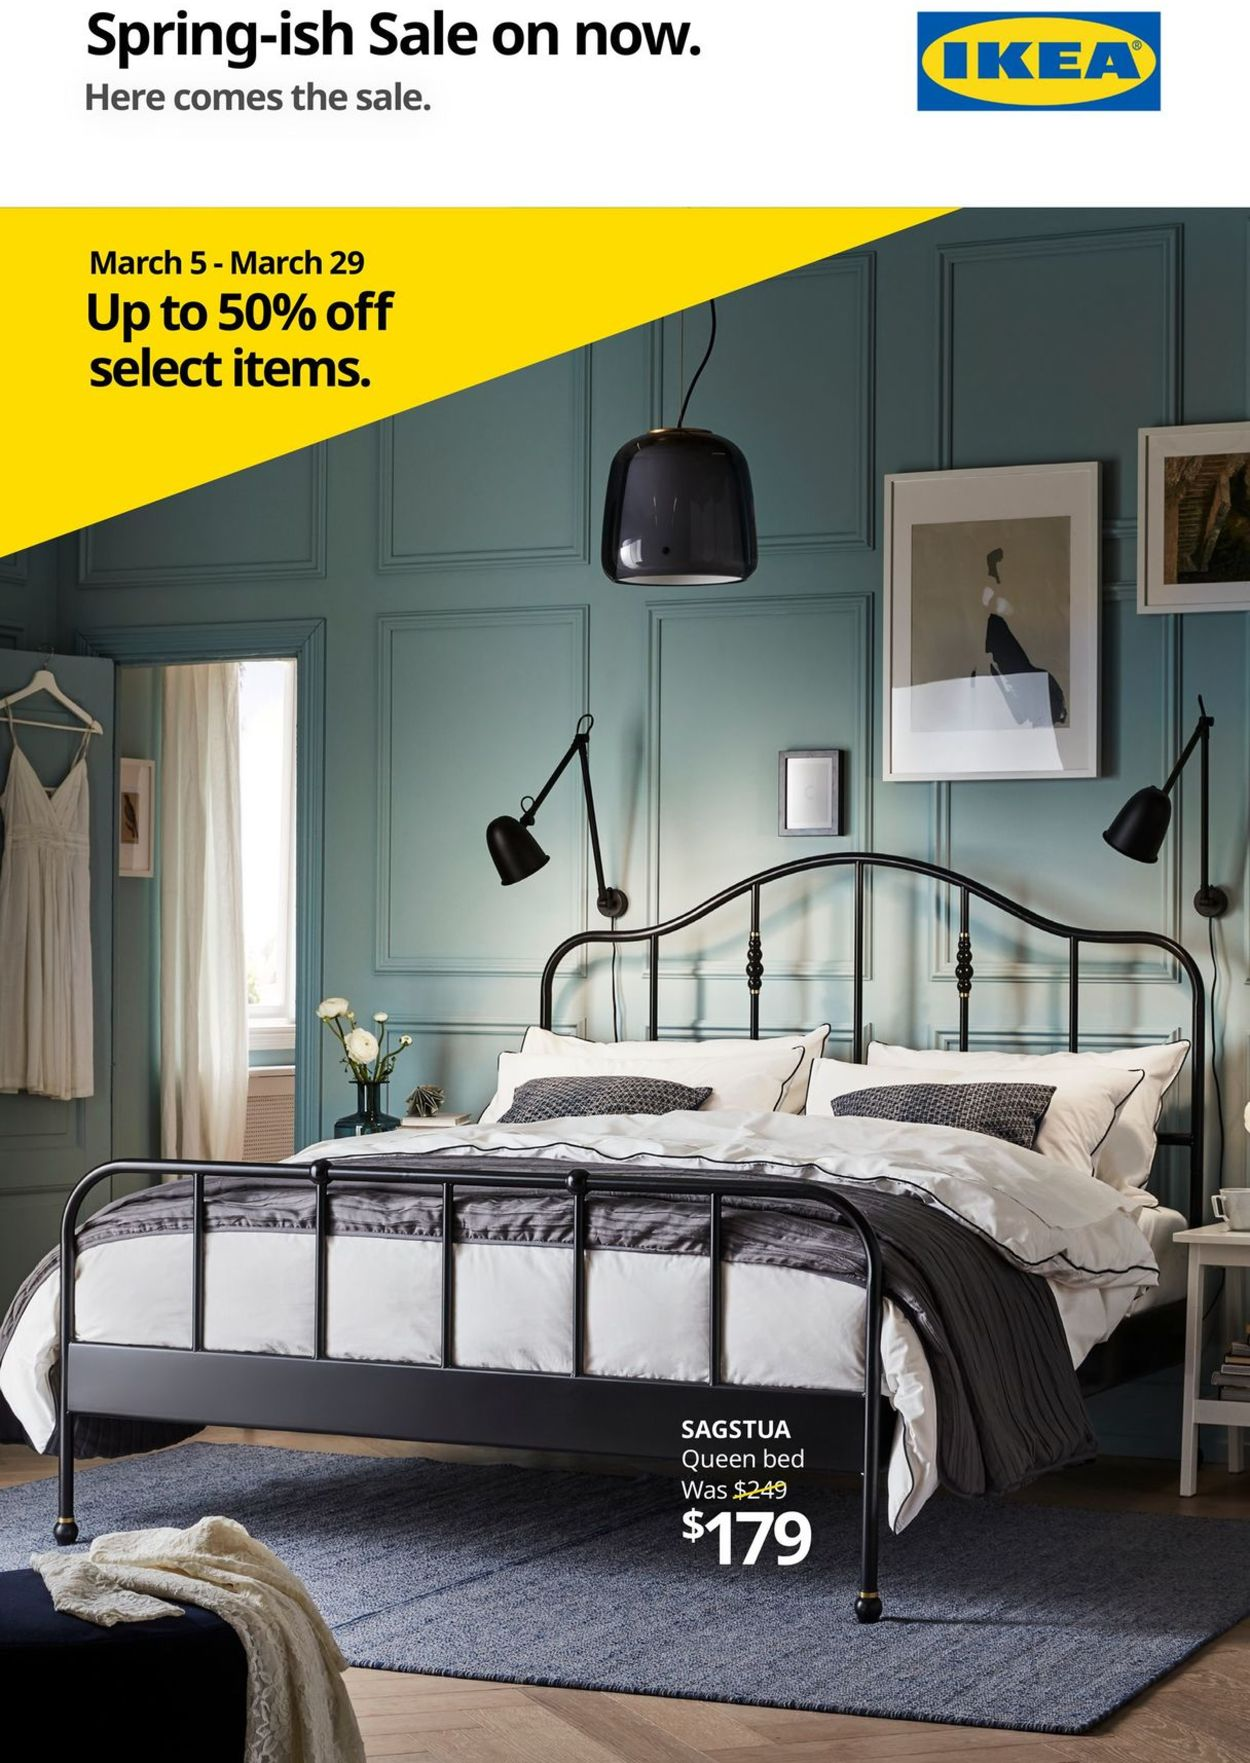 IKEA Flyer - 03/05-03/29/2020